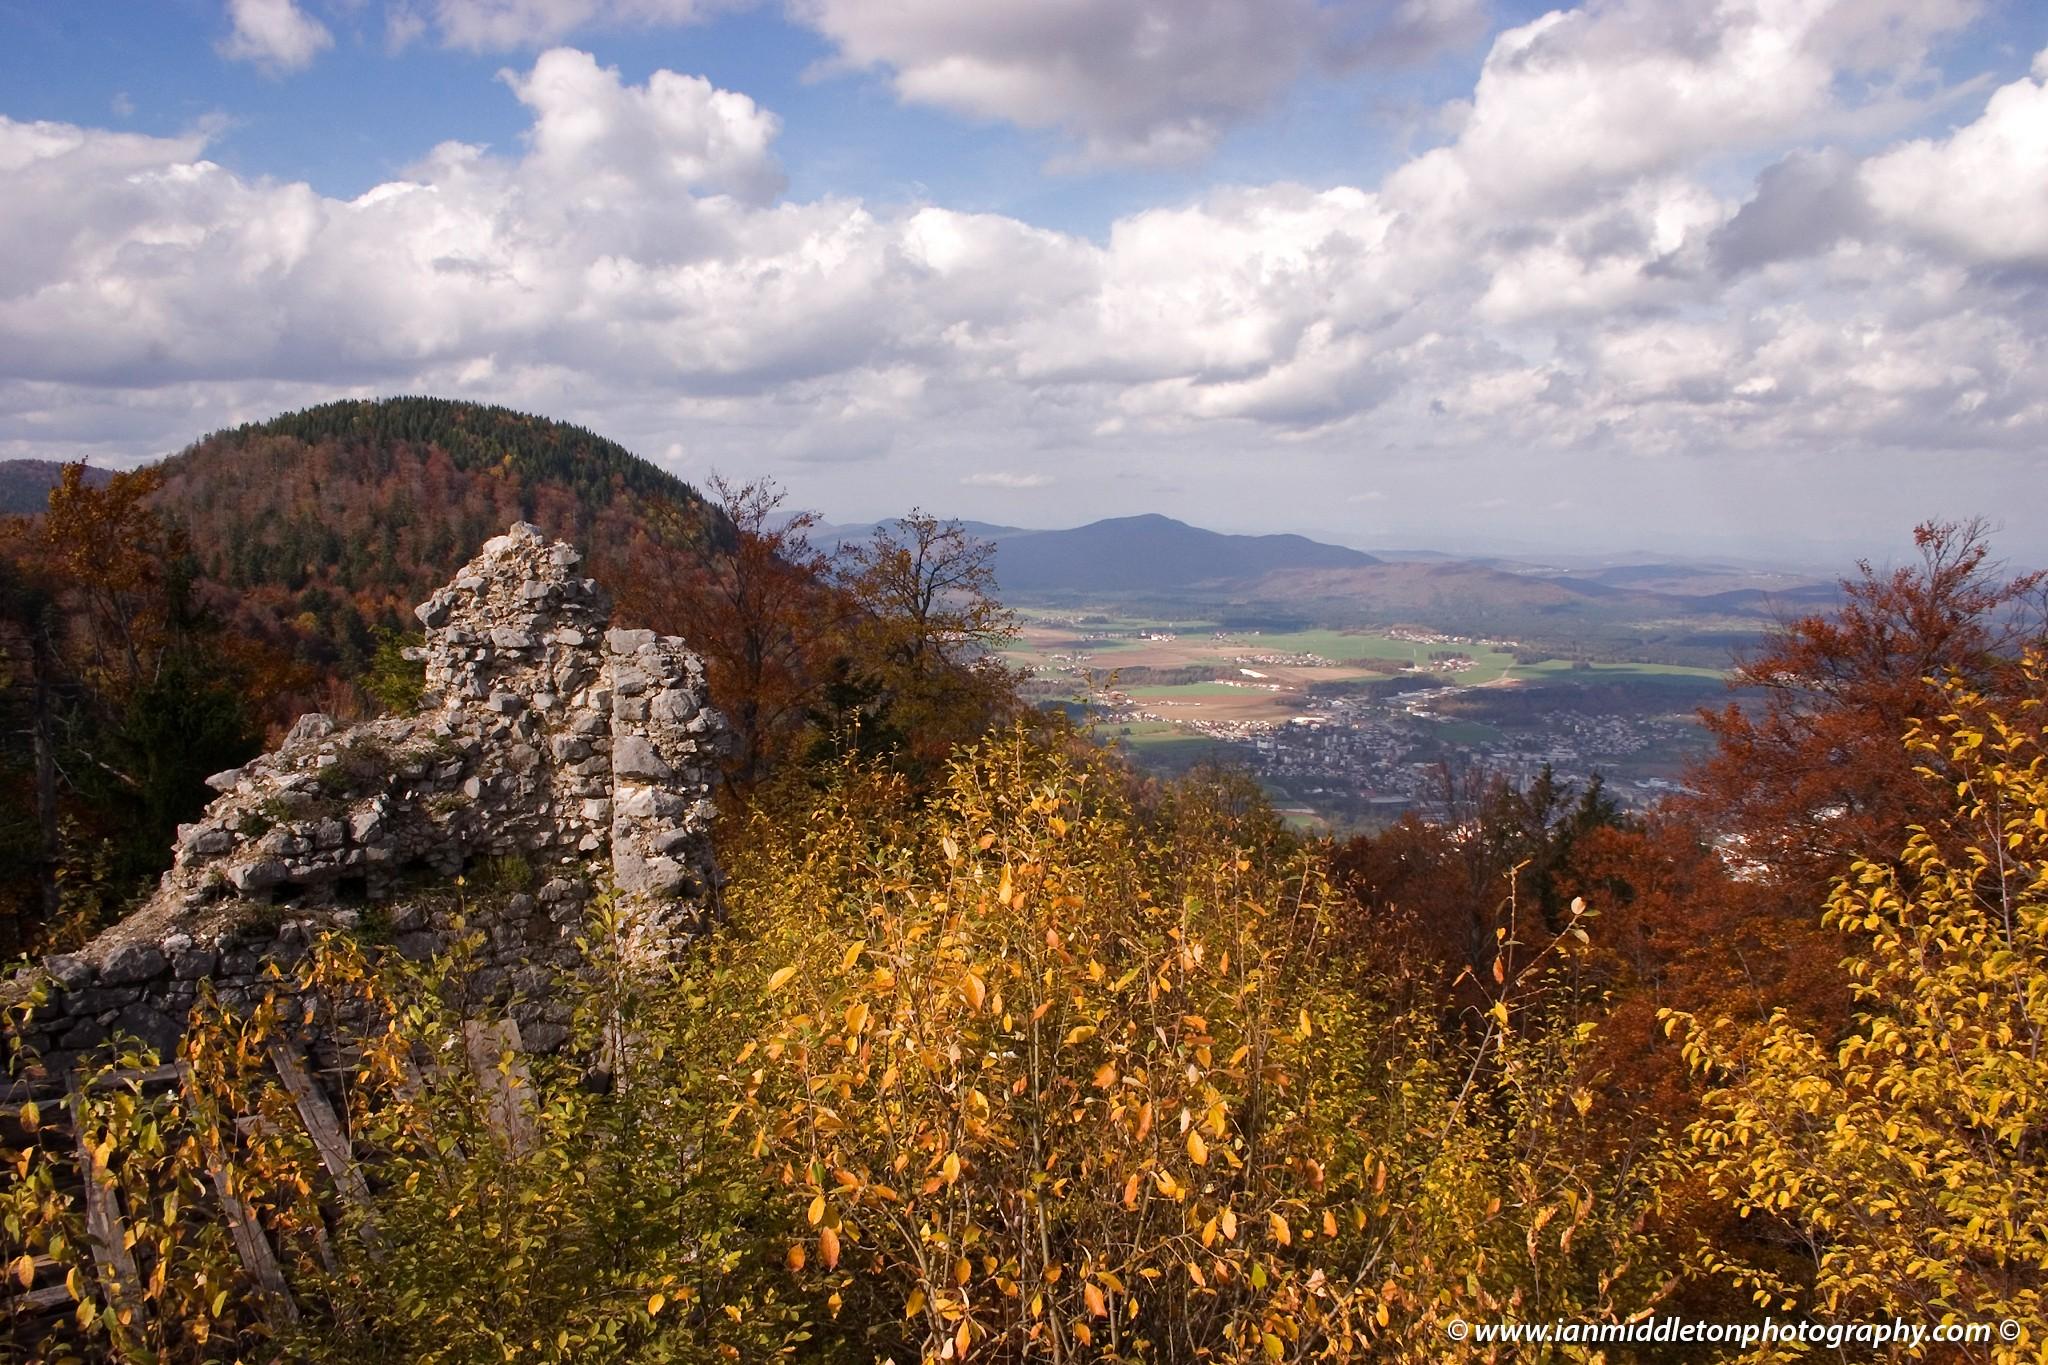 Ruins of Friedrichstein Castle, built as a love-nest by the Counts of Celje in 1422. Kocevje, Slovenia.